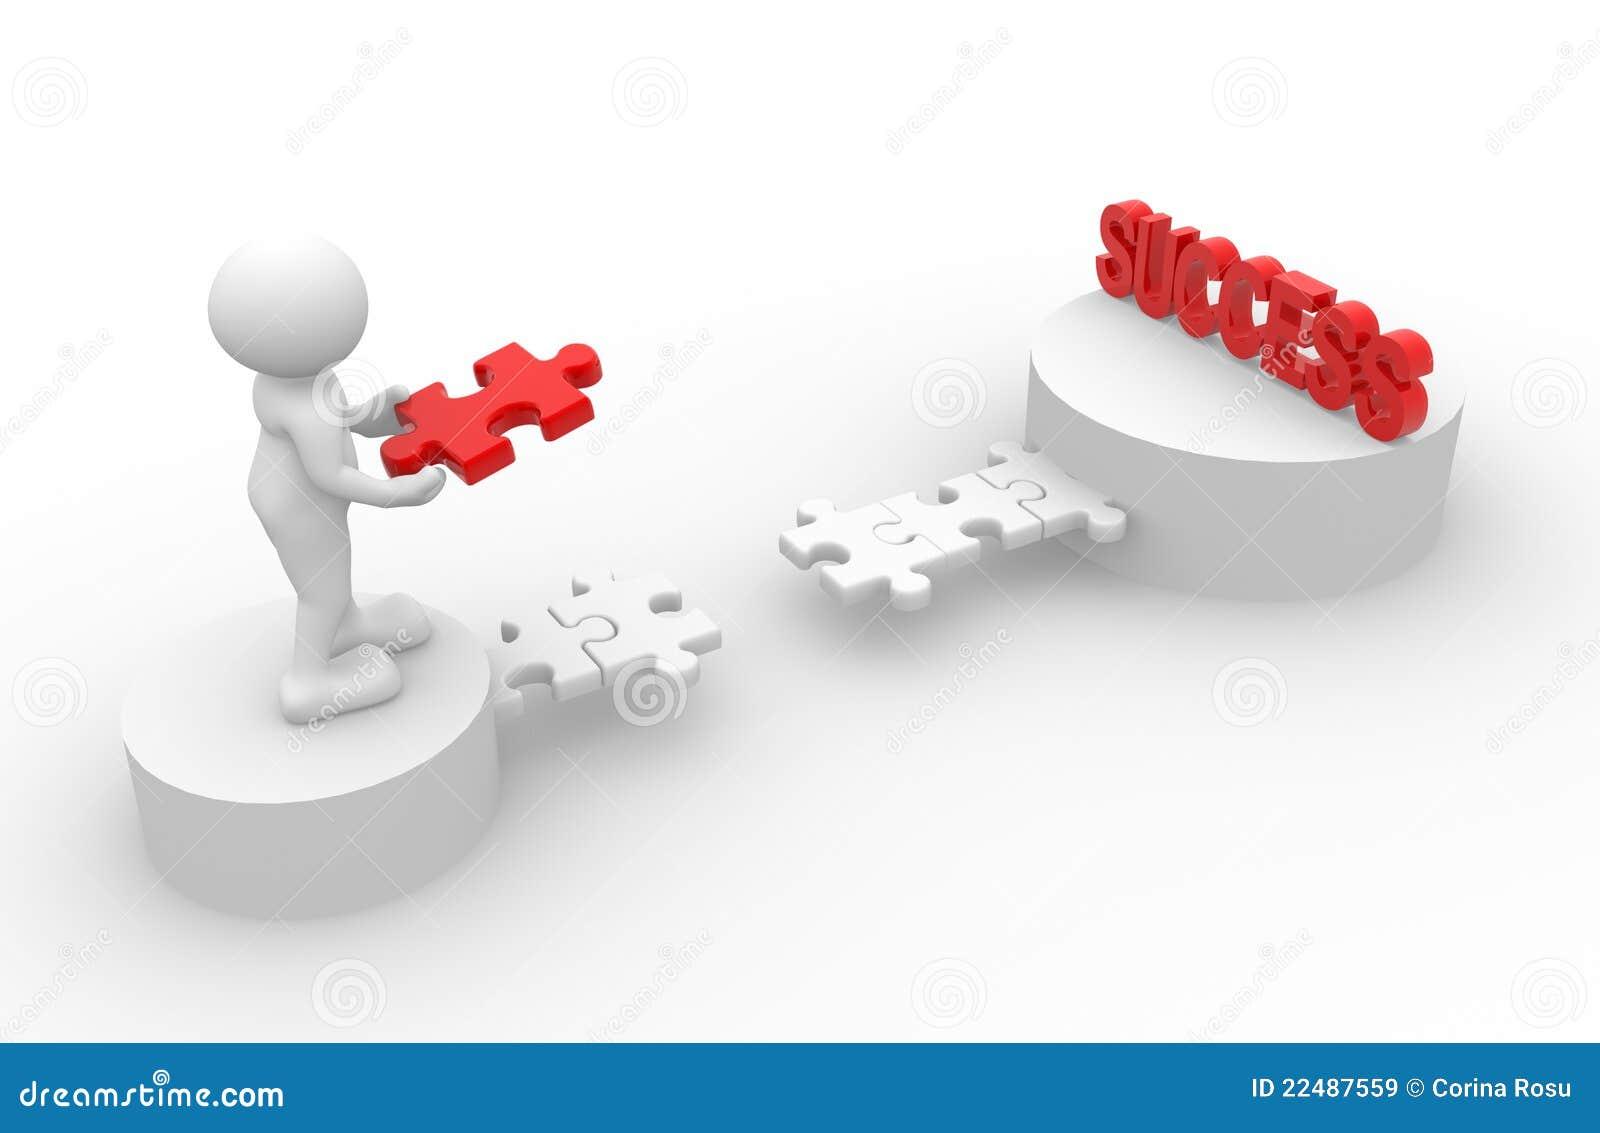 Figure  Ring Puzzle